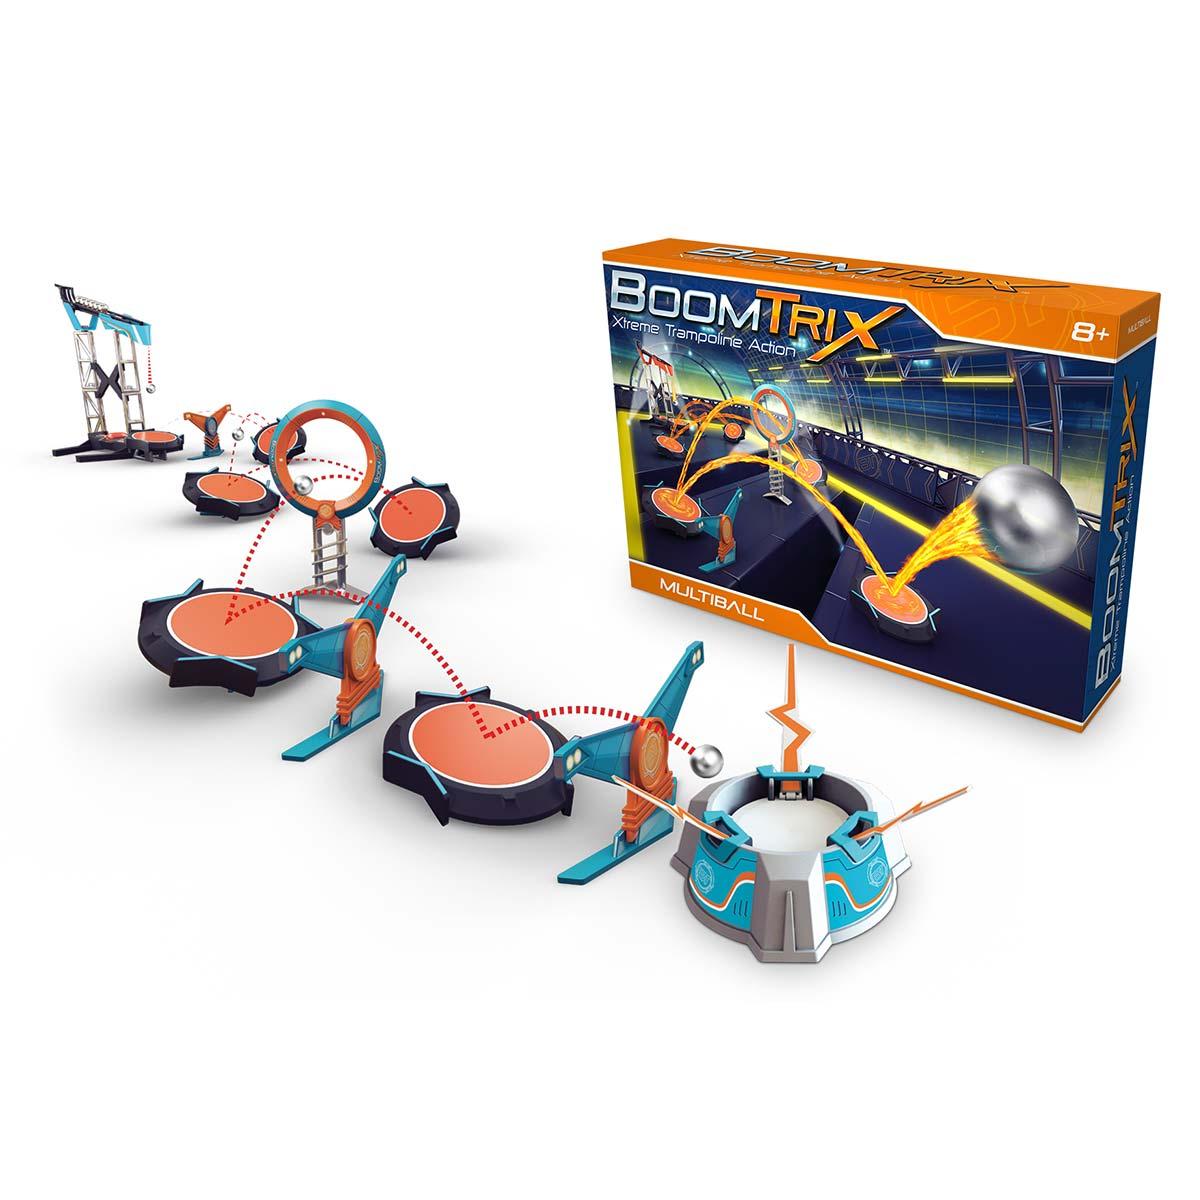 Boom-Trix, Multiball set